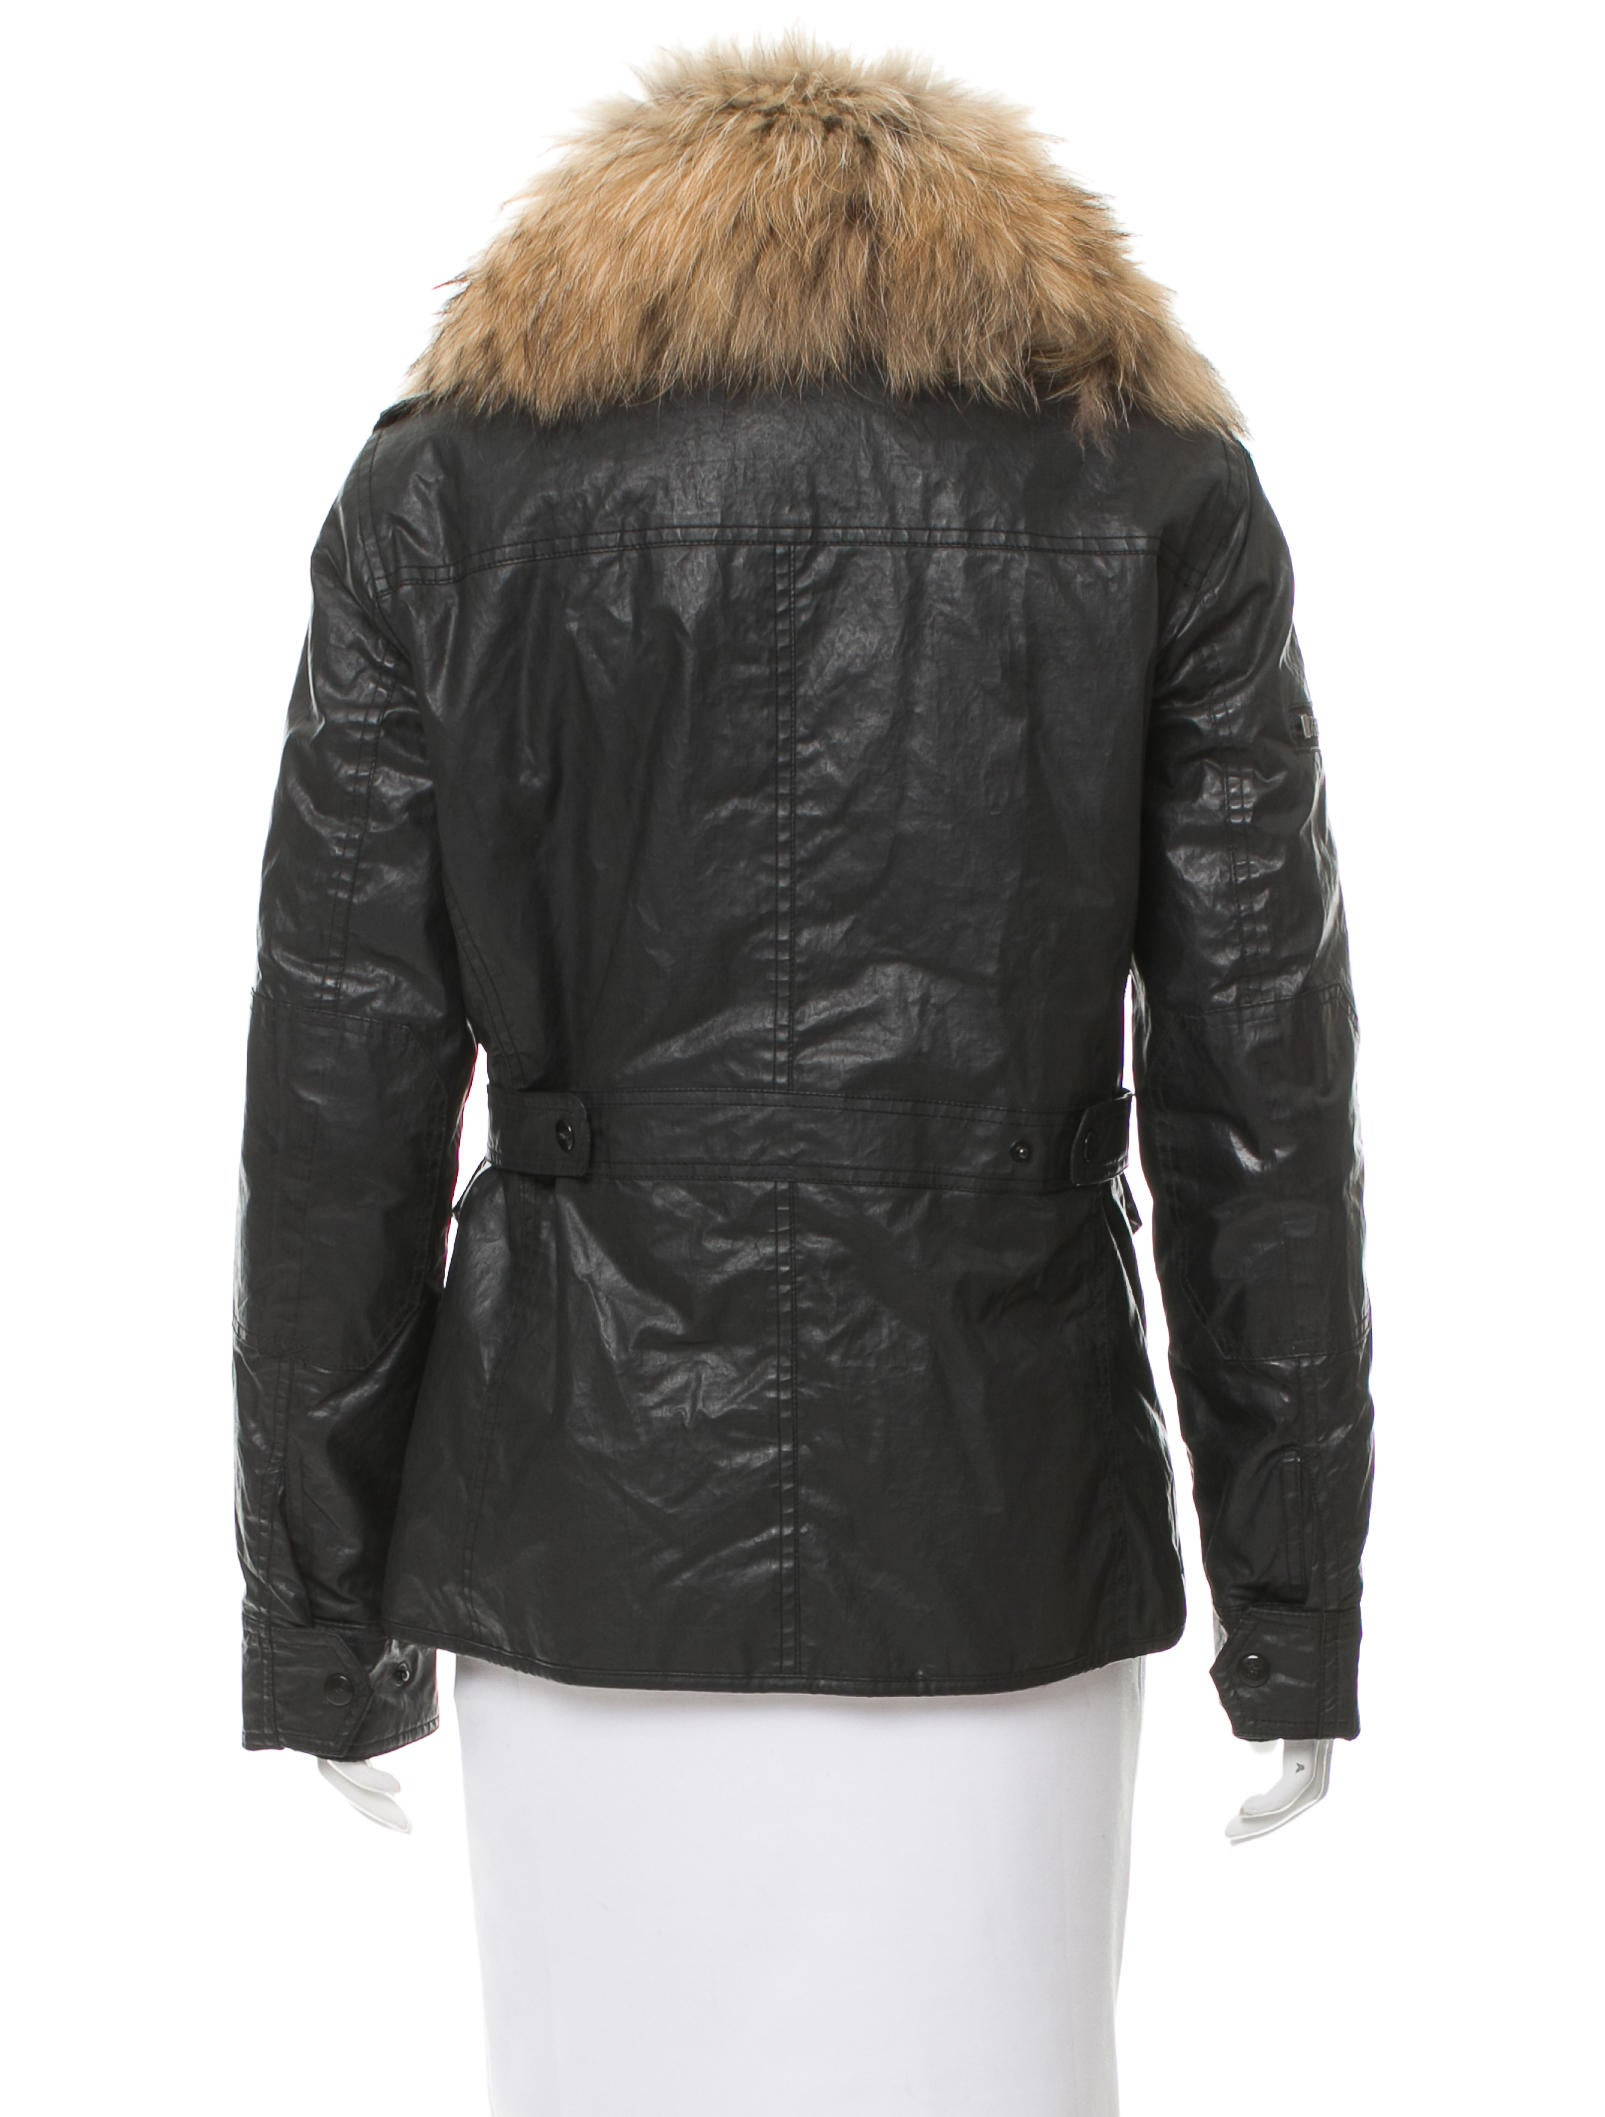 Fox leather jacket